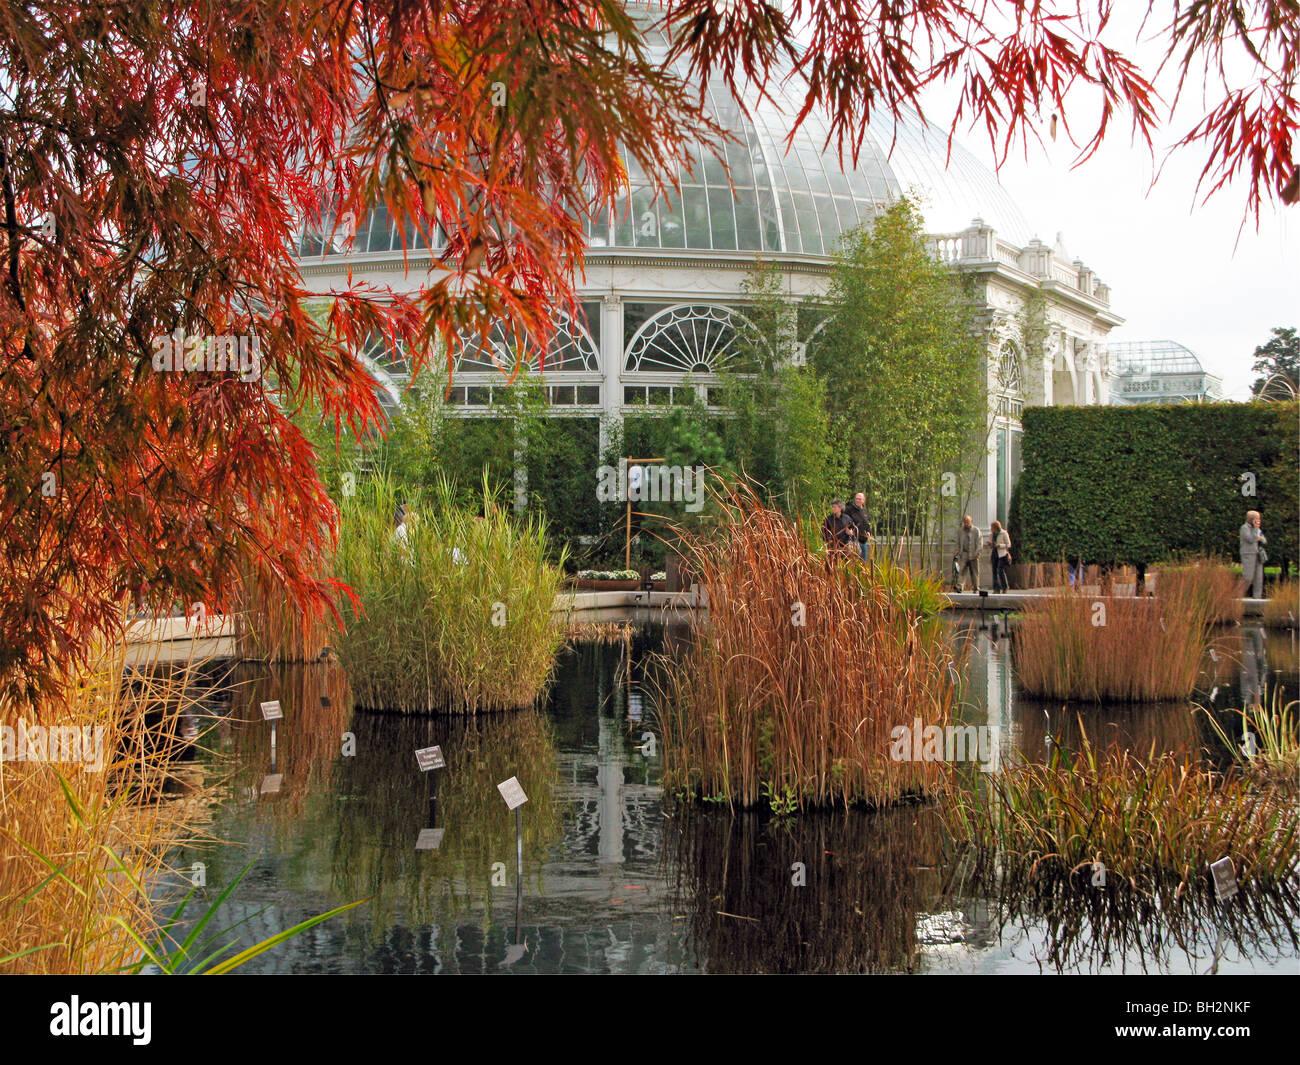 Japanese Garden National Botanic Garden Stock Photos & Japanese ...